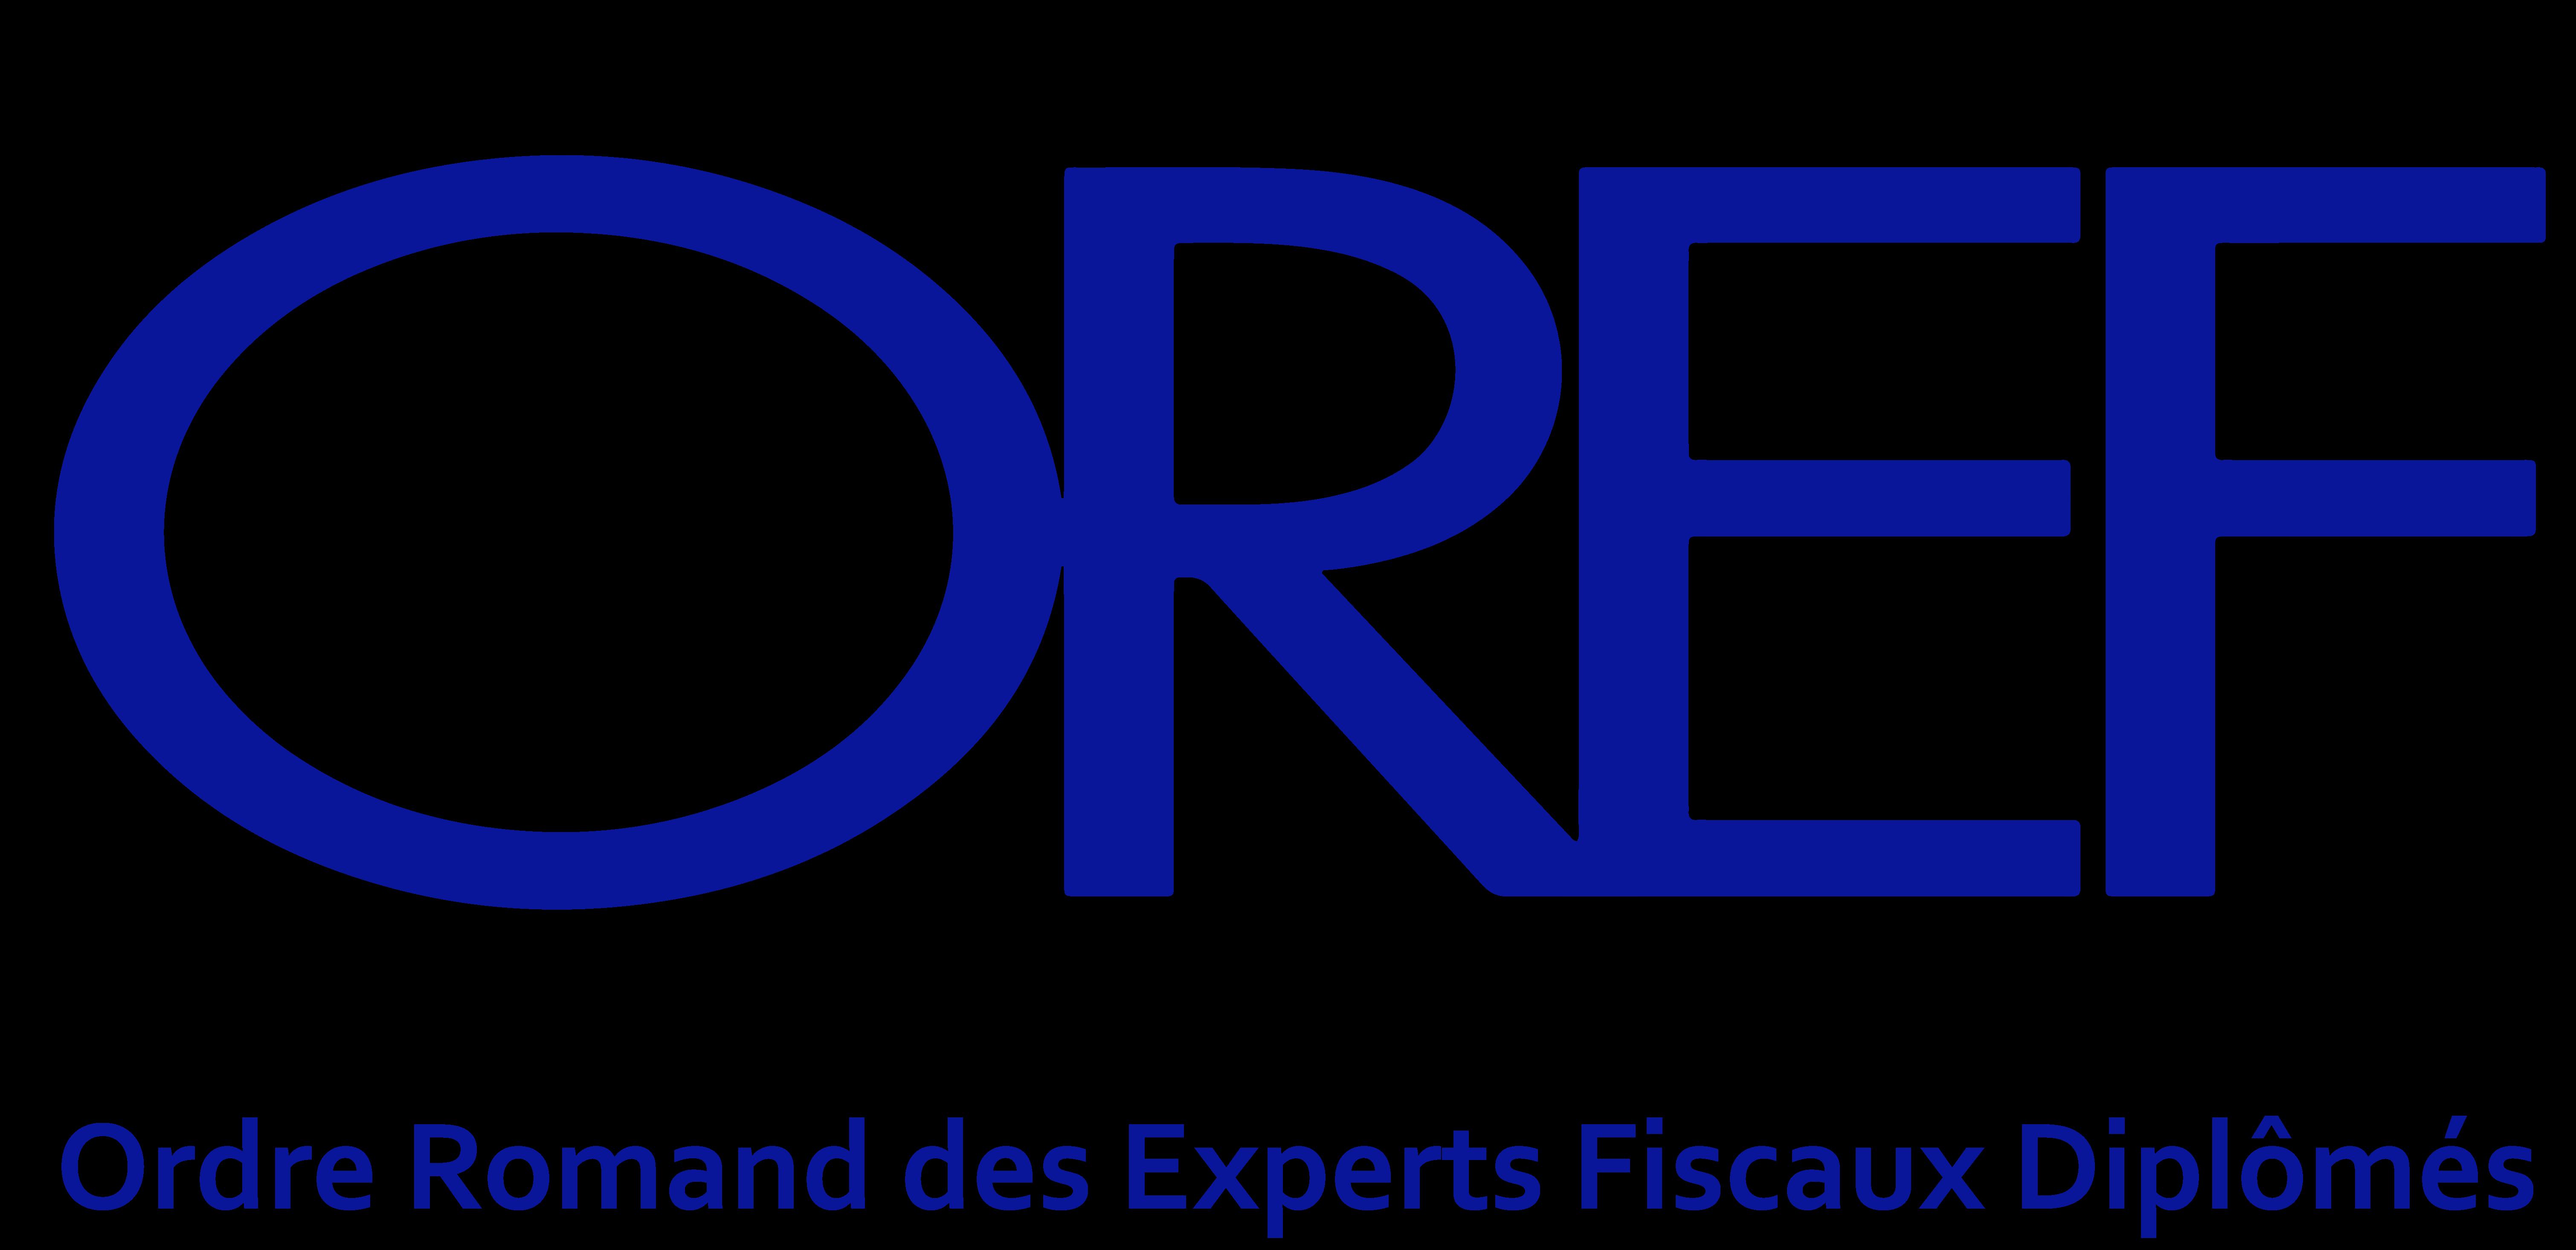 http://www.oref.ch/site/fr/